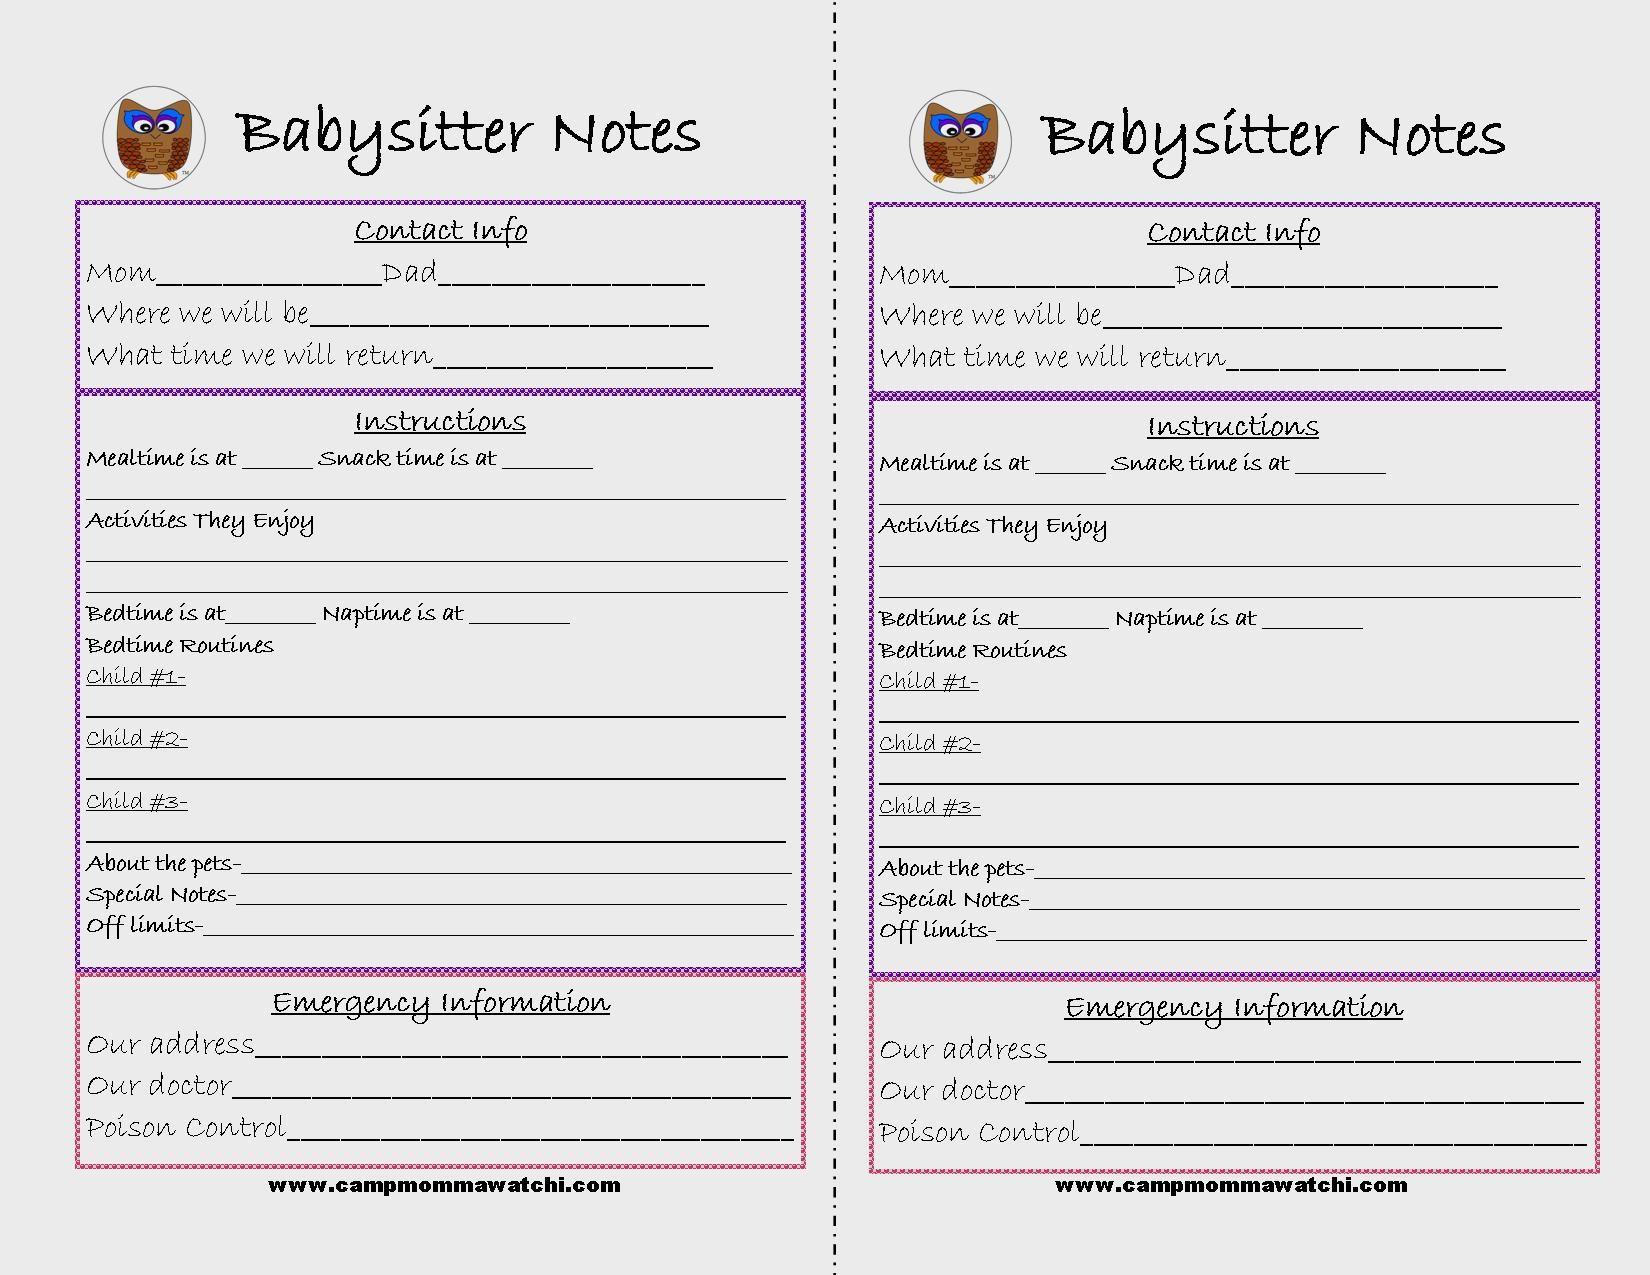 Free Printable Babysitter Notes